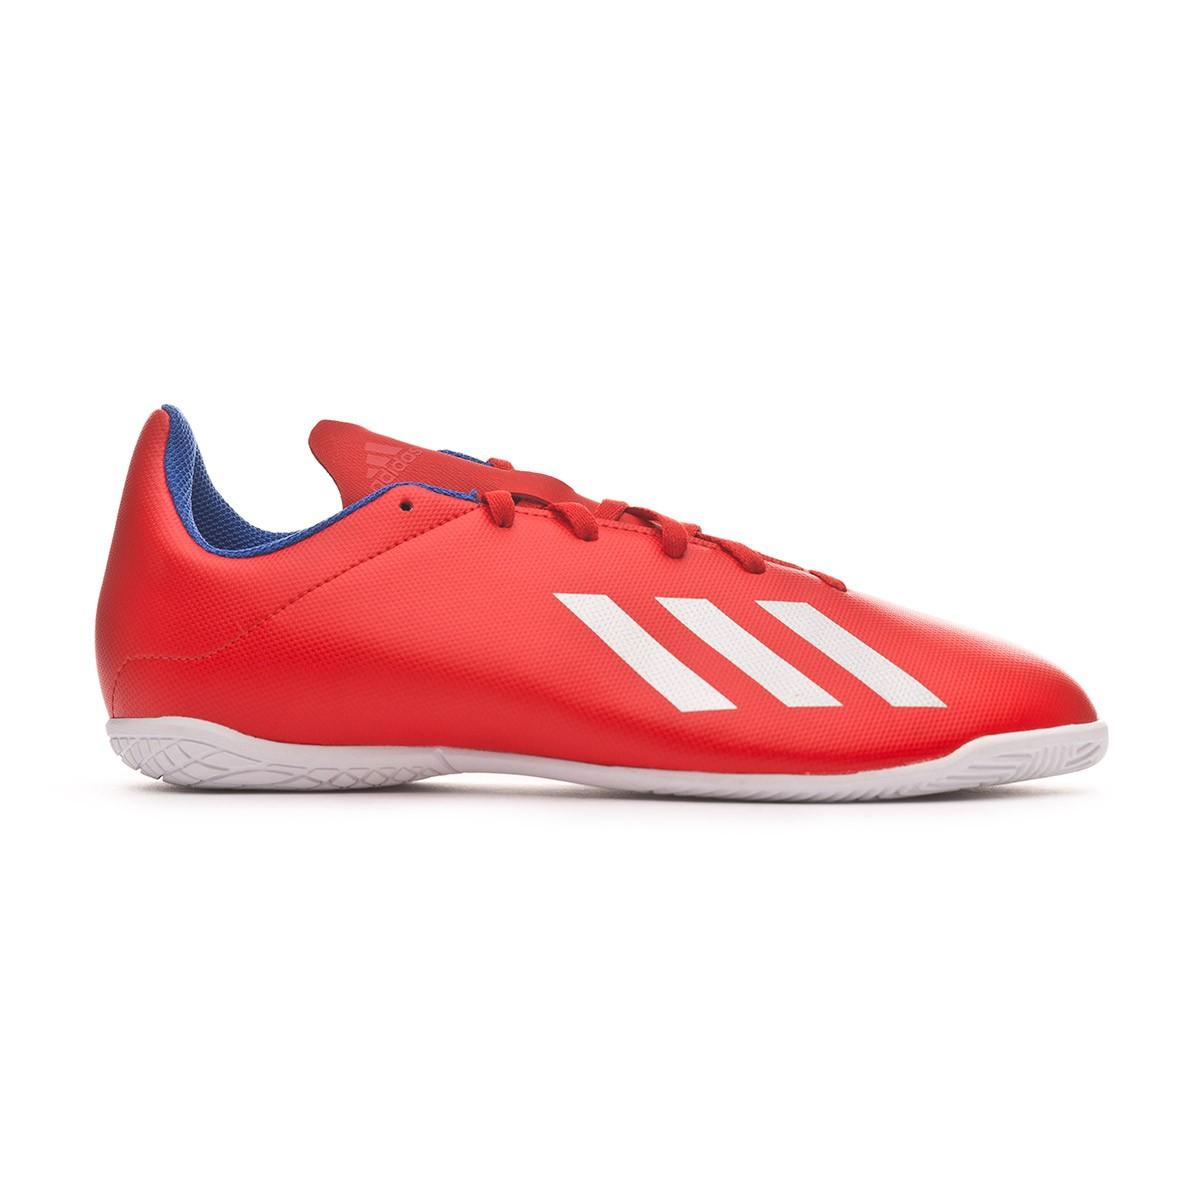 dfeddbf44 Futsal Boot adidas Kids X Tango 18.4 IN Active red-Silver metallic-Bold blue  - Tienda de fútbol Fútbol Emotion